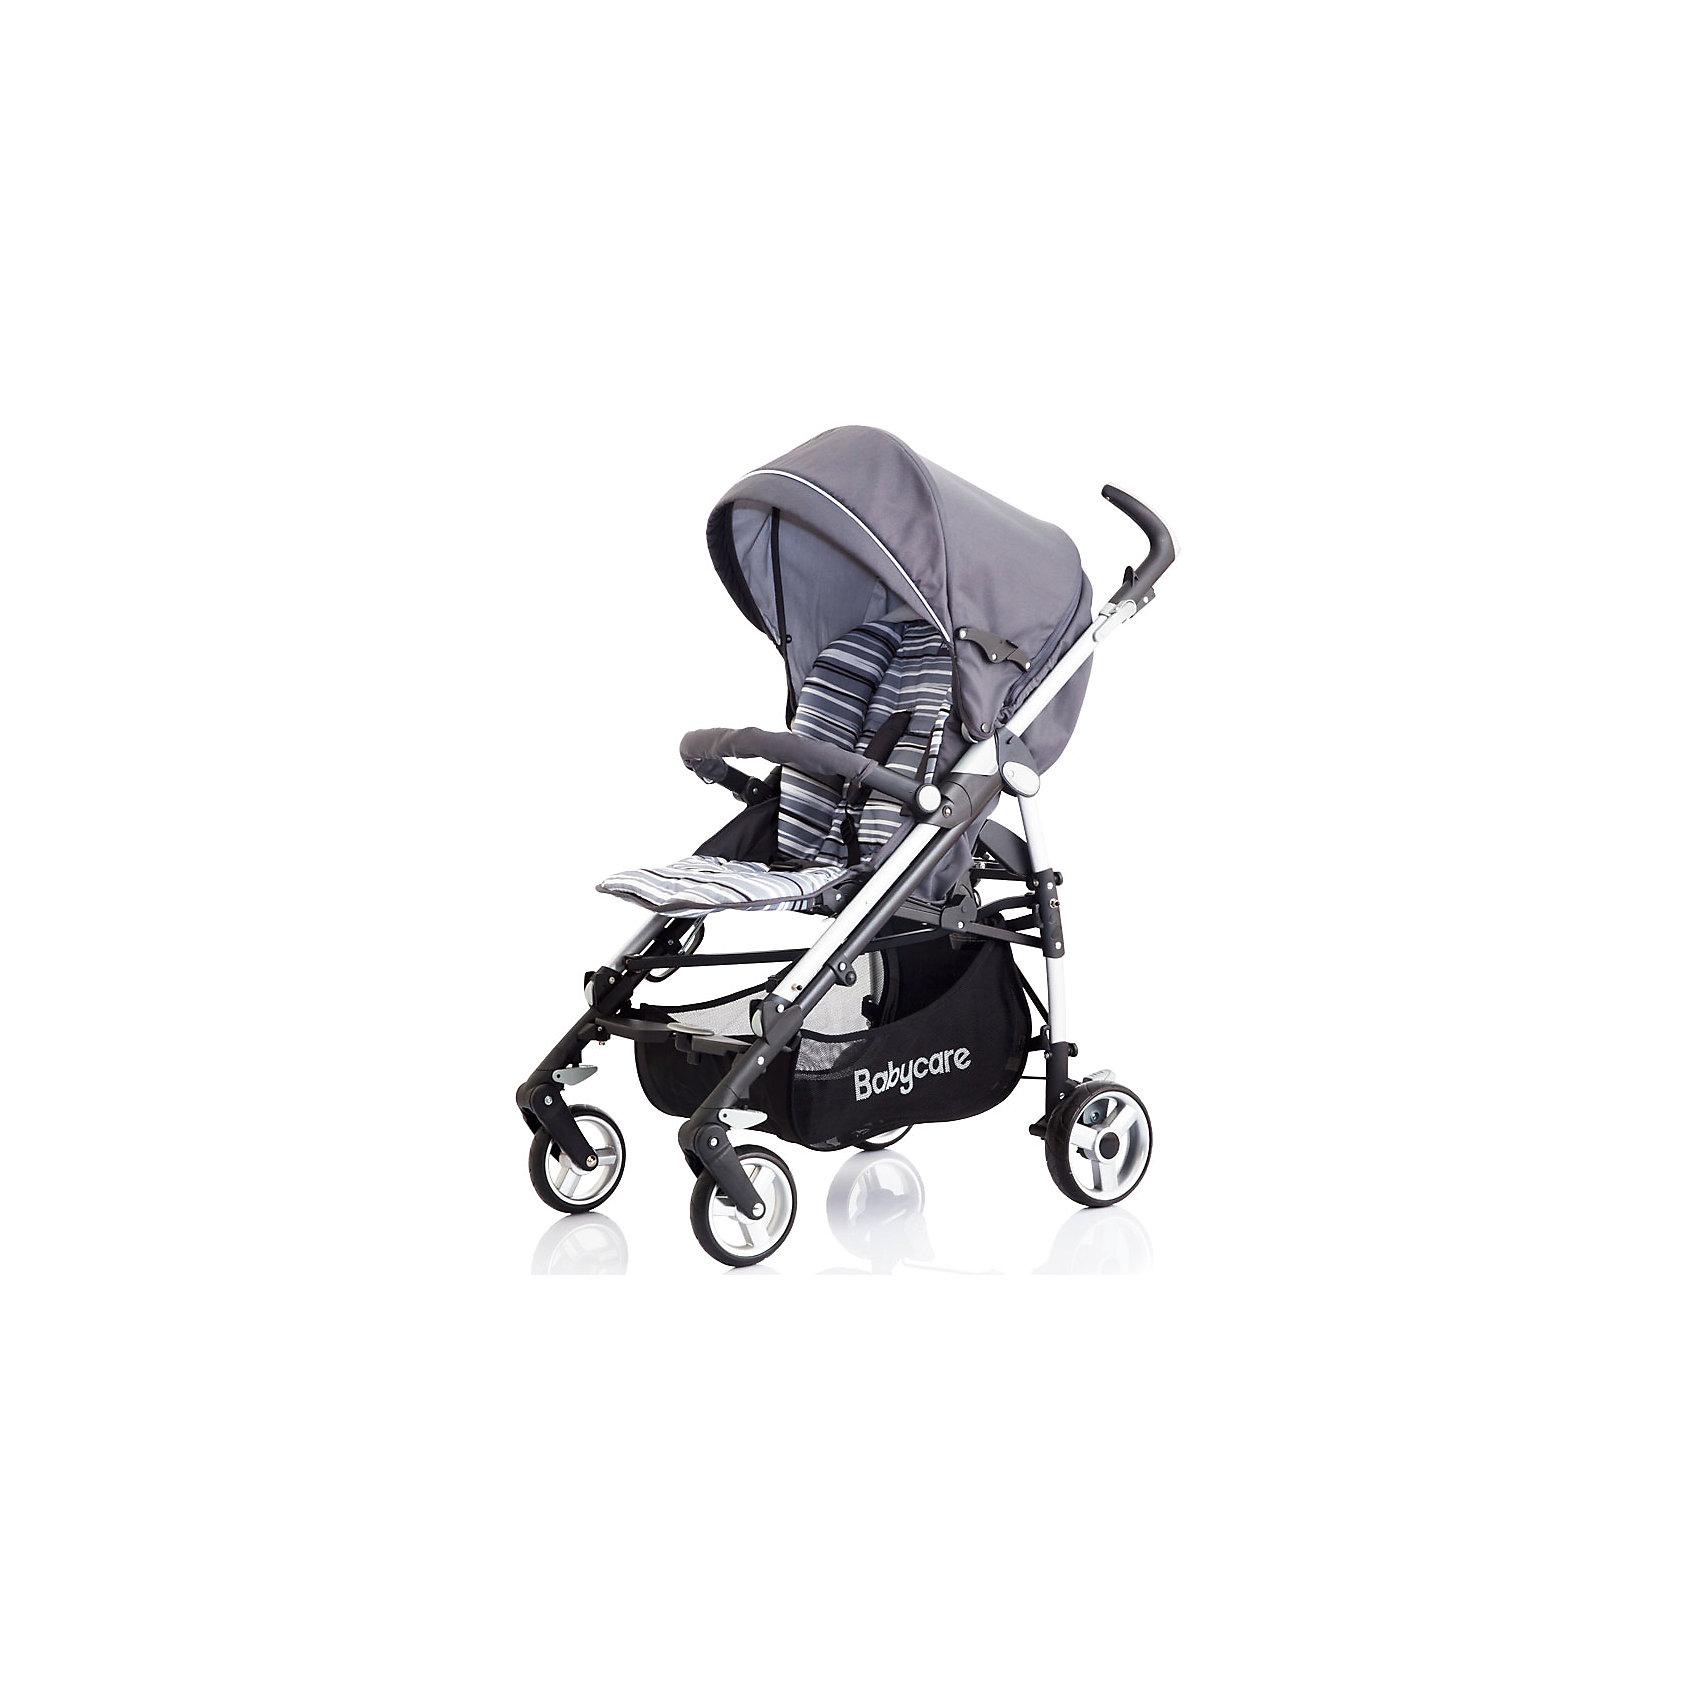 Baby Care Коляска-трость GT4, Baby Care, серый